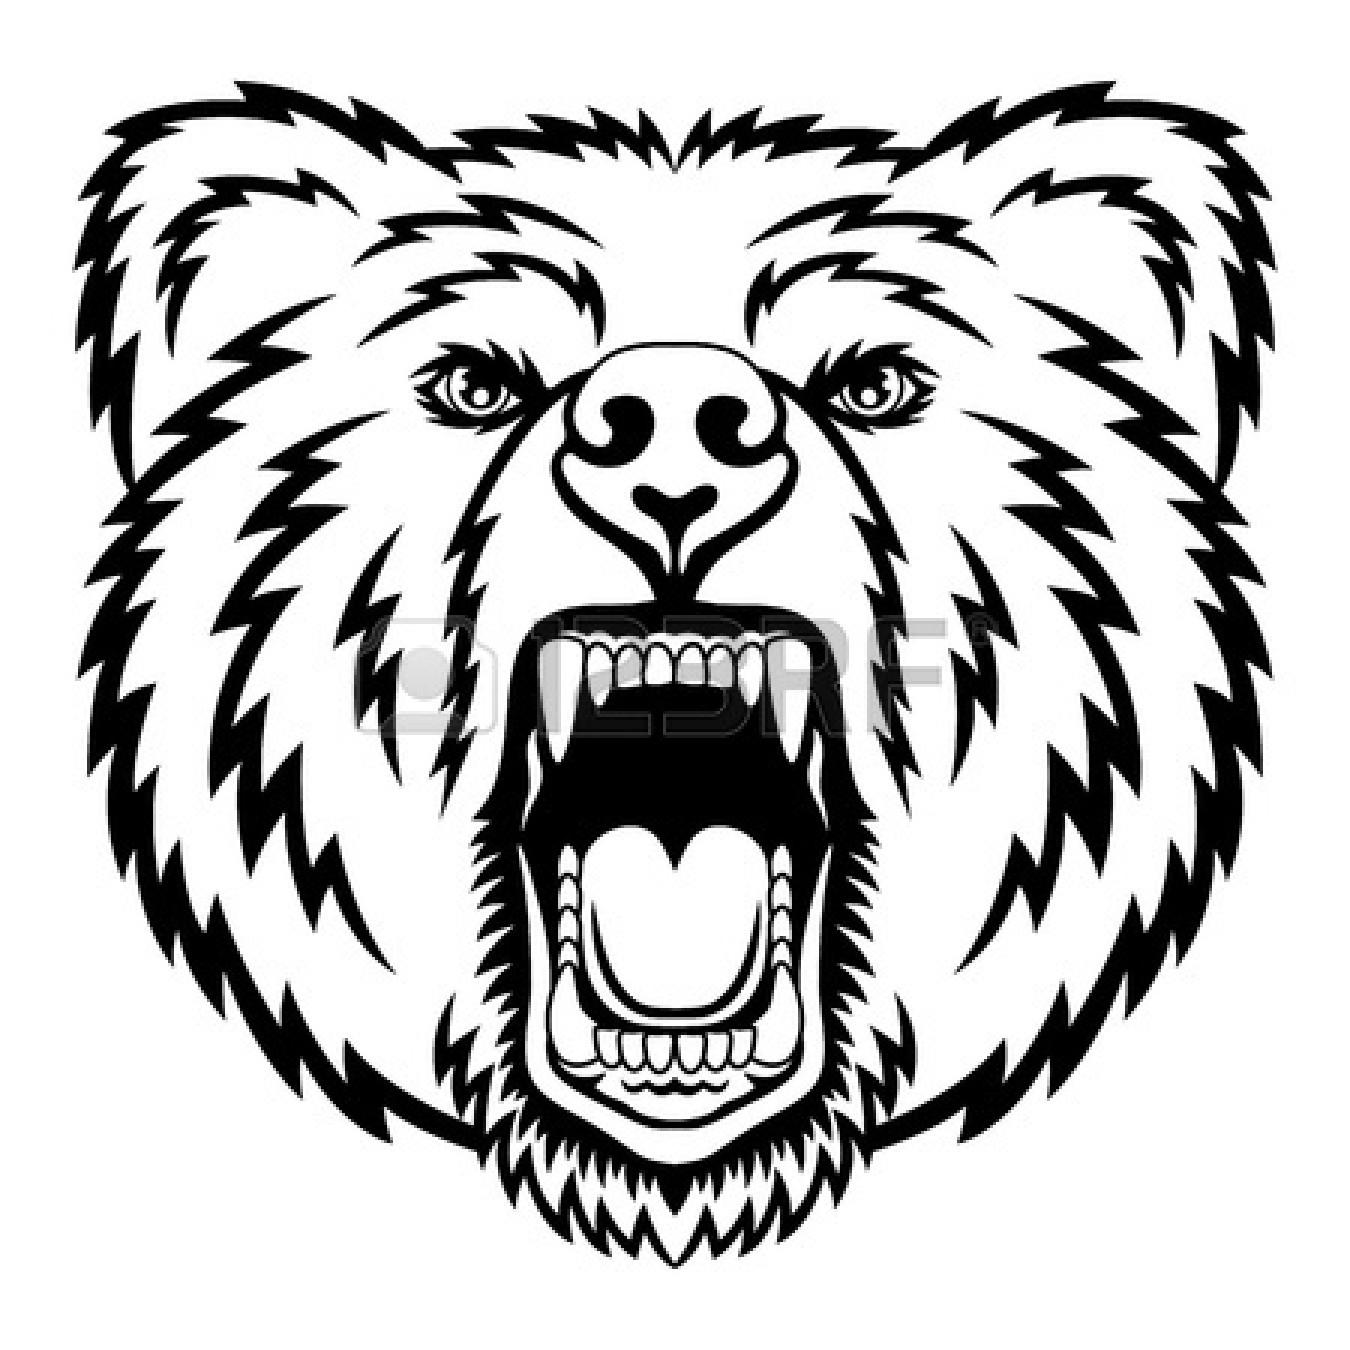 1350x1350 Drawing A Bear Face